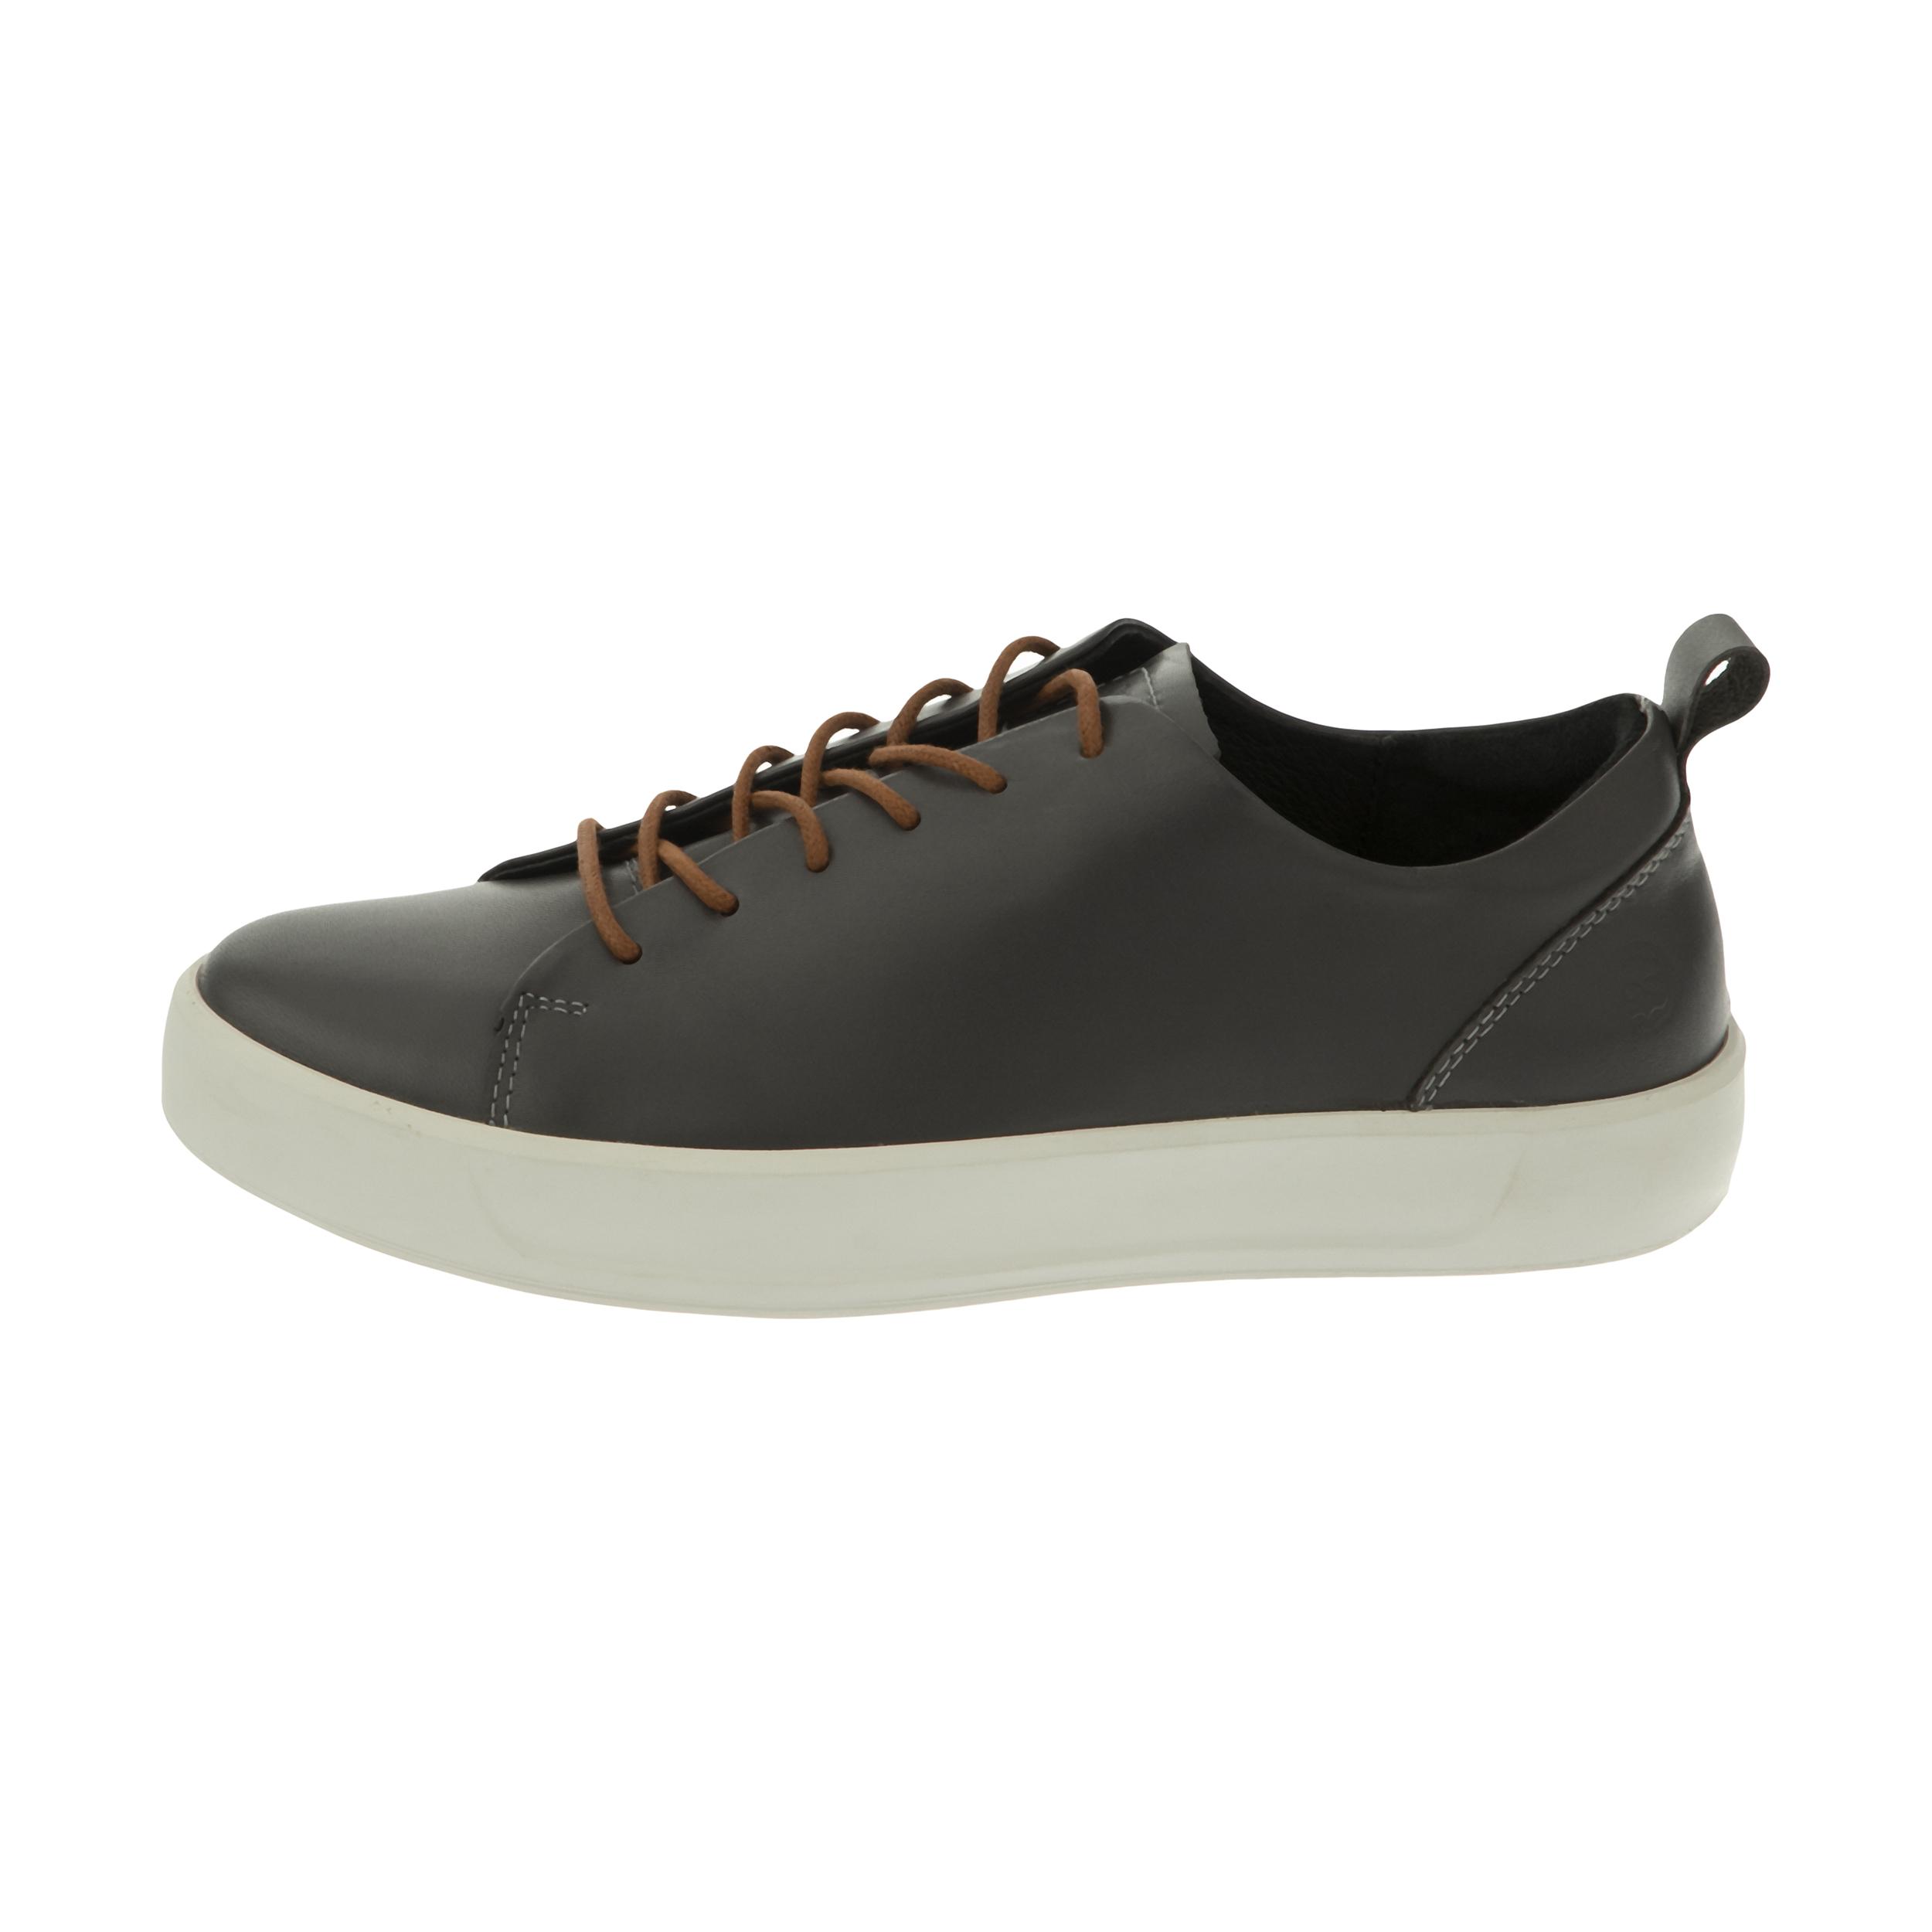 کفش روزمره مردانه اکو مدل 450994